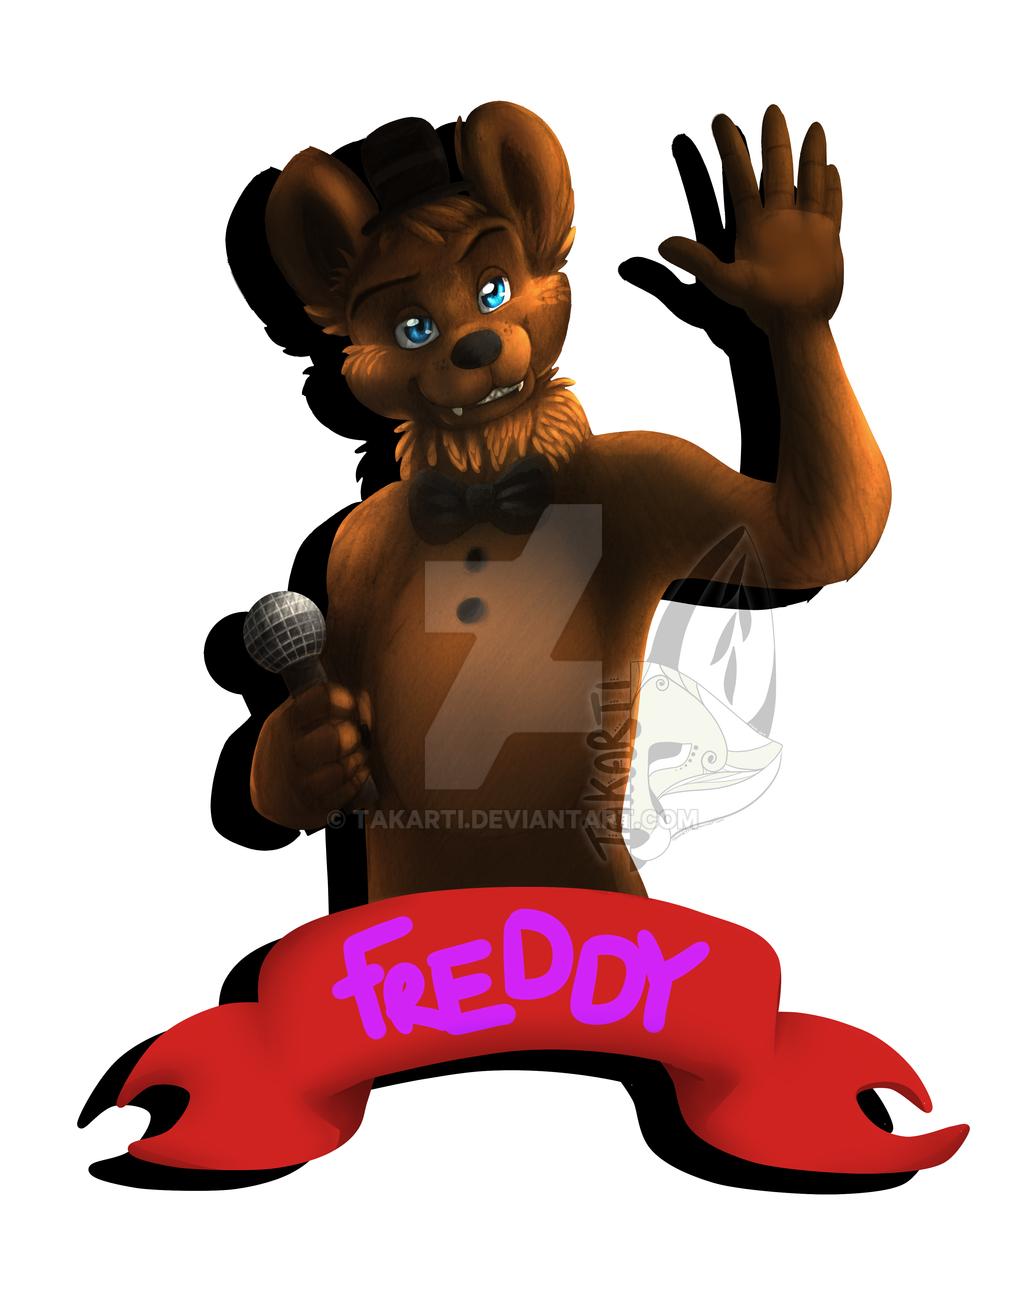 Five Nights at Freddy's: Freddy by Takarti